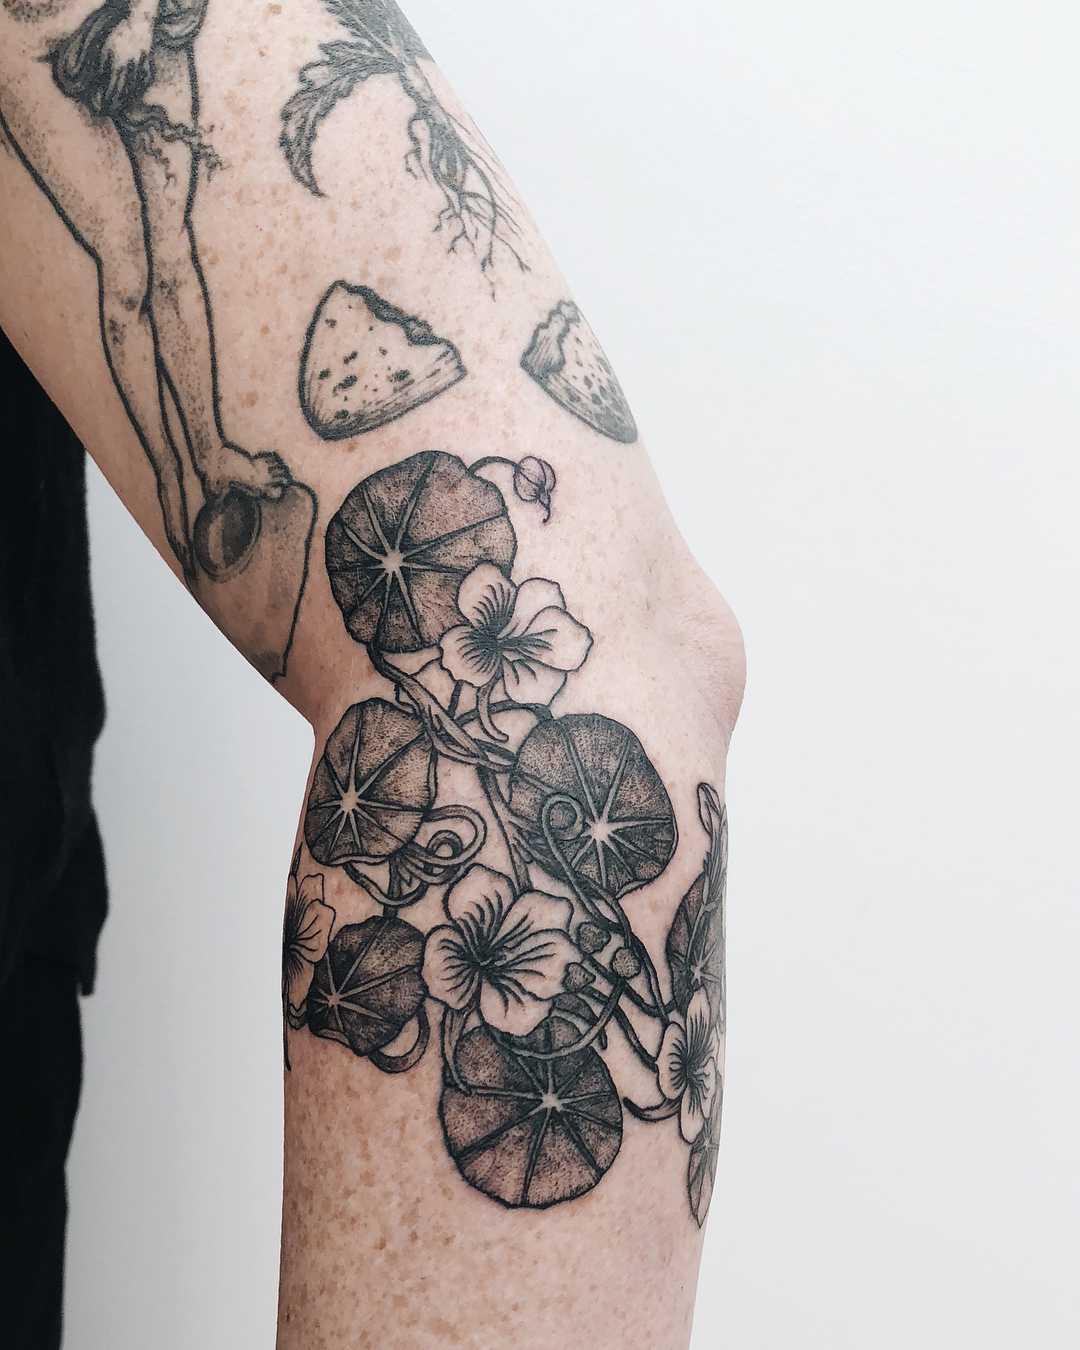 Nasturtiums tattoo by Finley Jordan